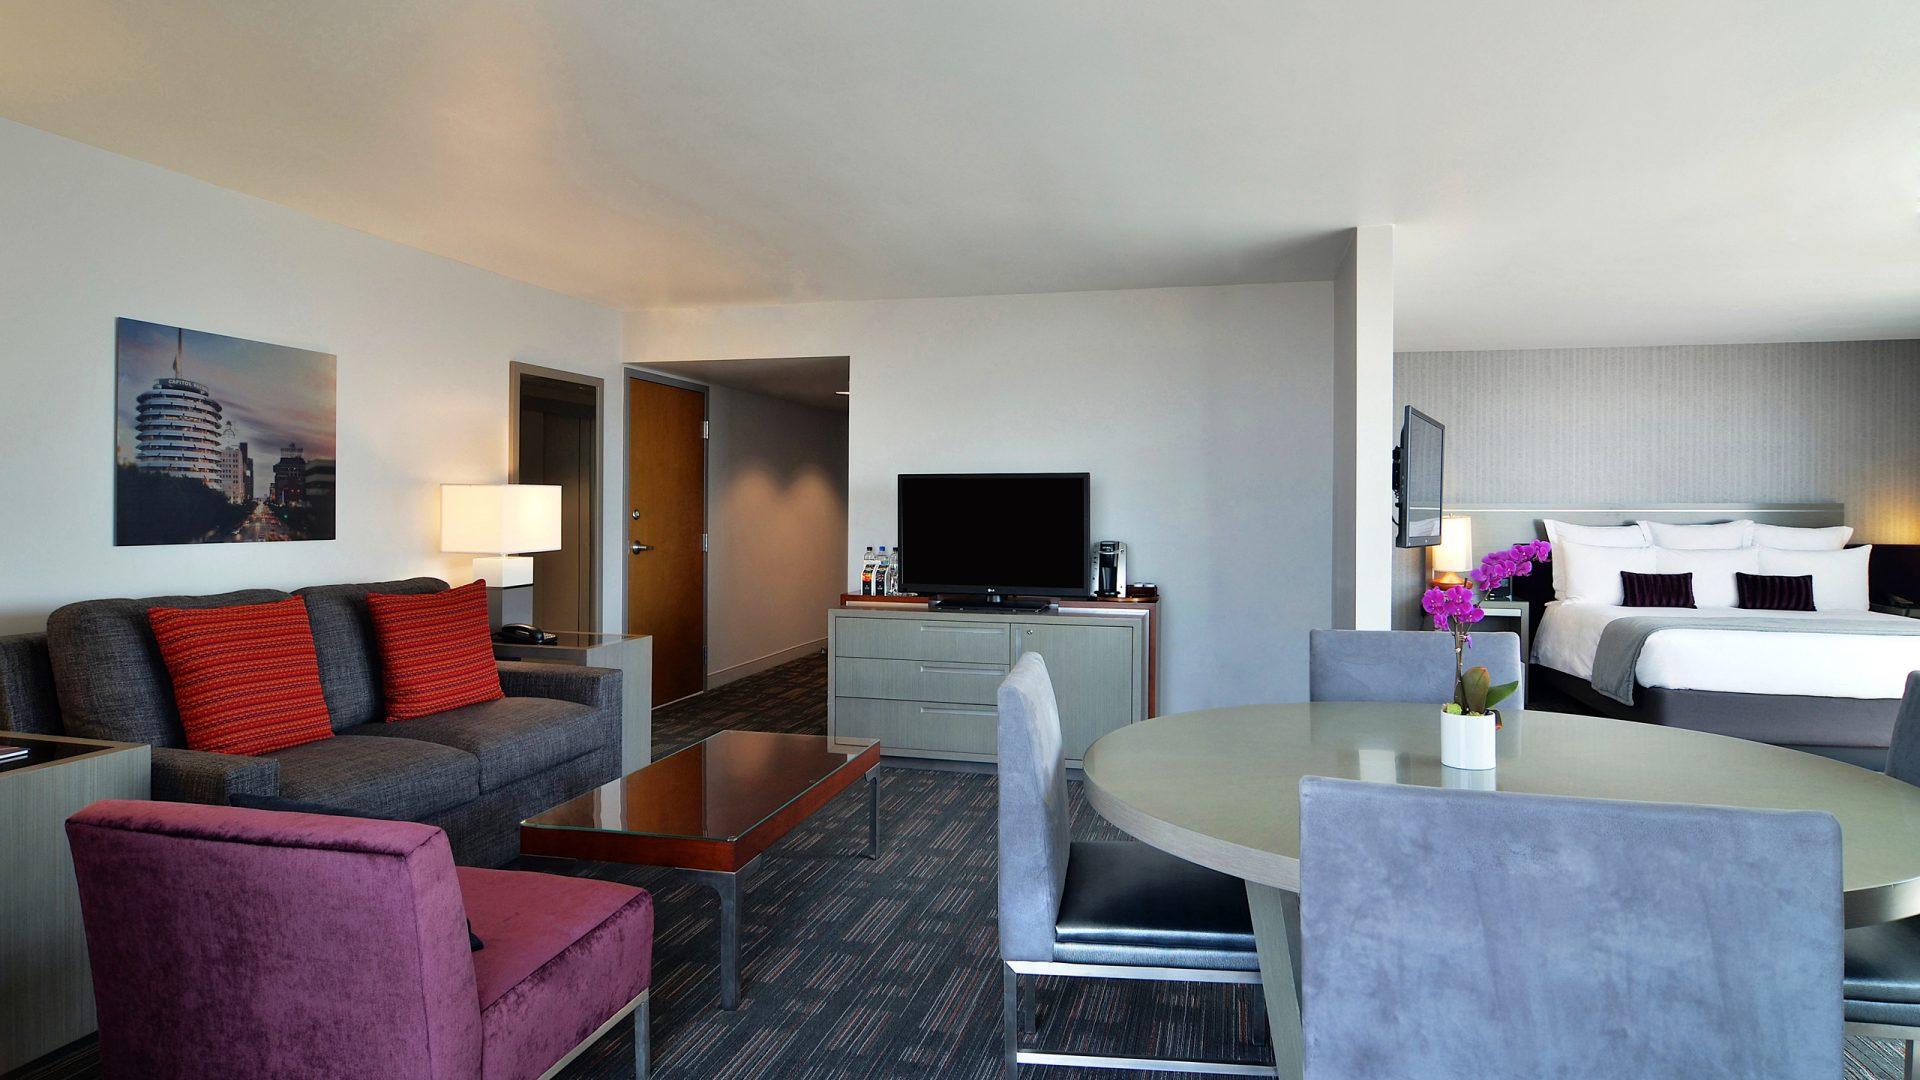 Hotel Suites In Hollywood Loews Hollywood Hotel